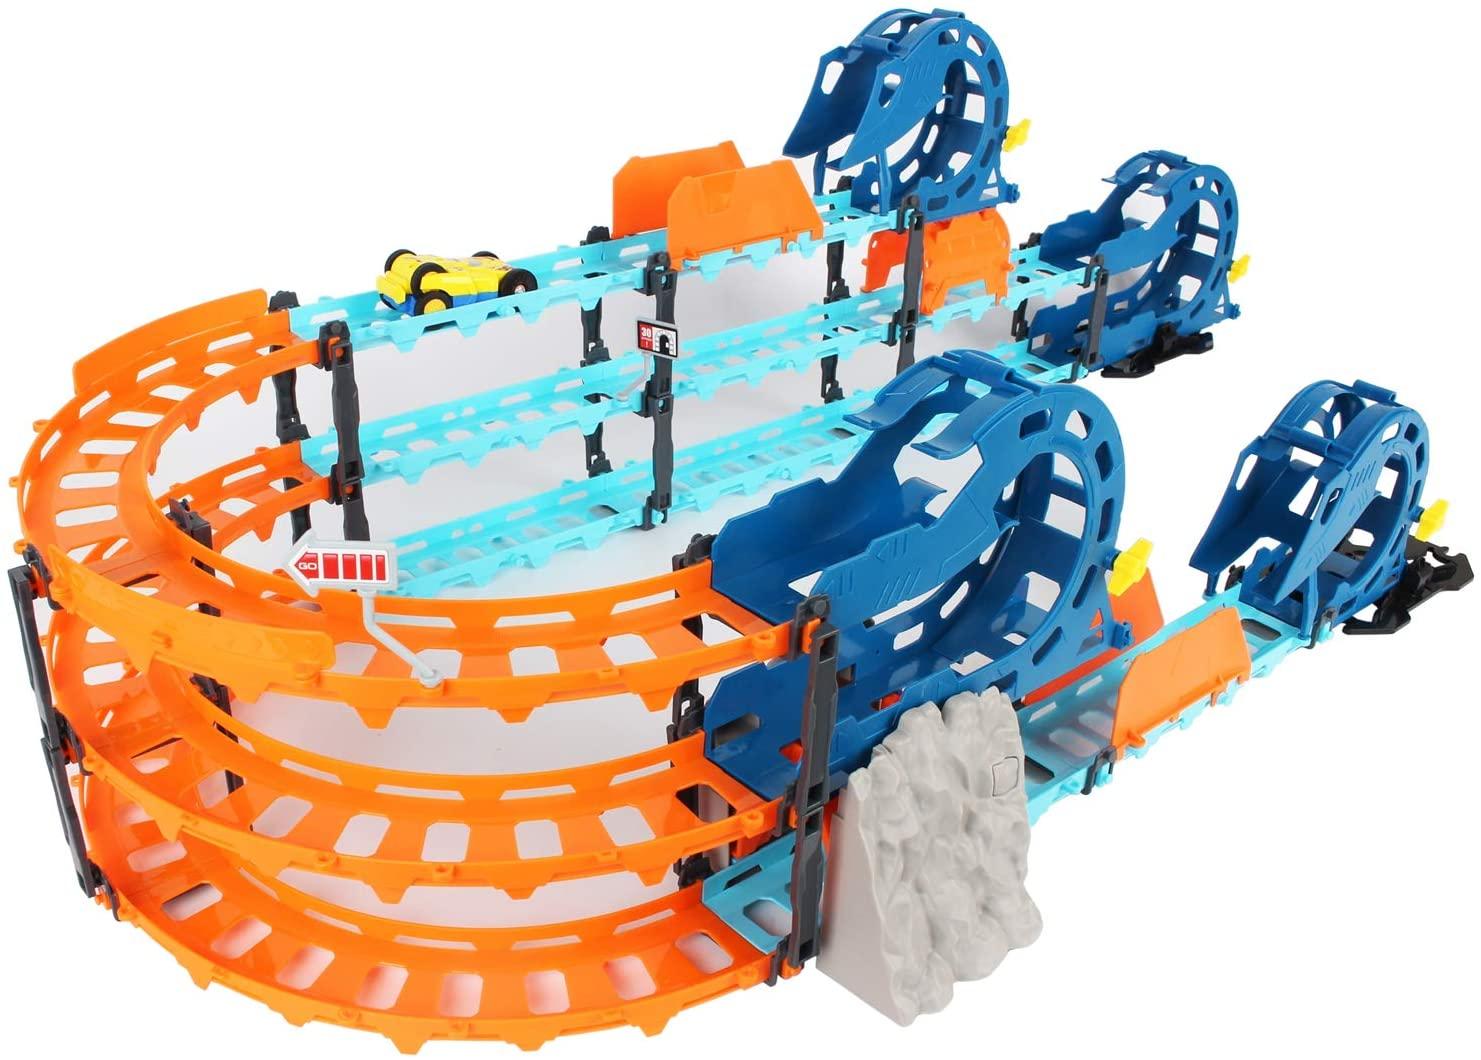 FeiWen Racing Track Car Toys-84PCS Electric Rail car Racing Track Set,Educational Toy Set Children Gift Children's Toys 3-6 Years